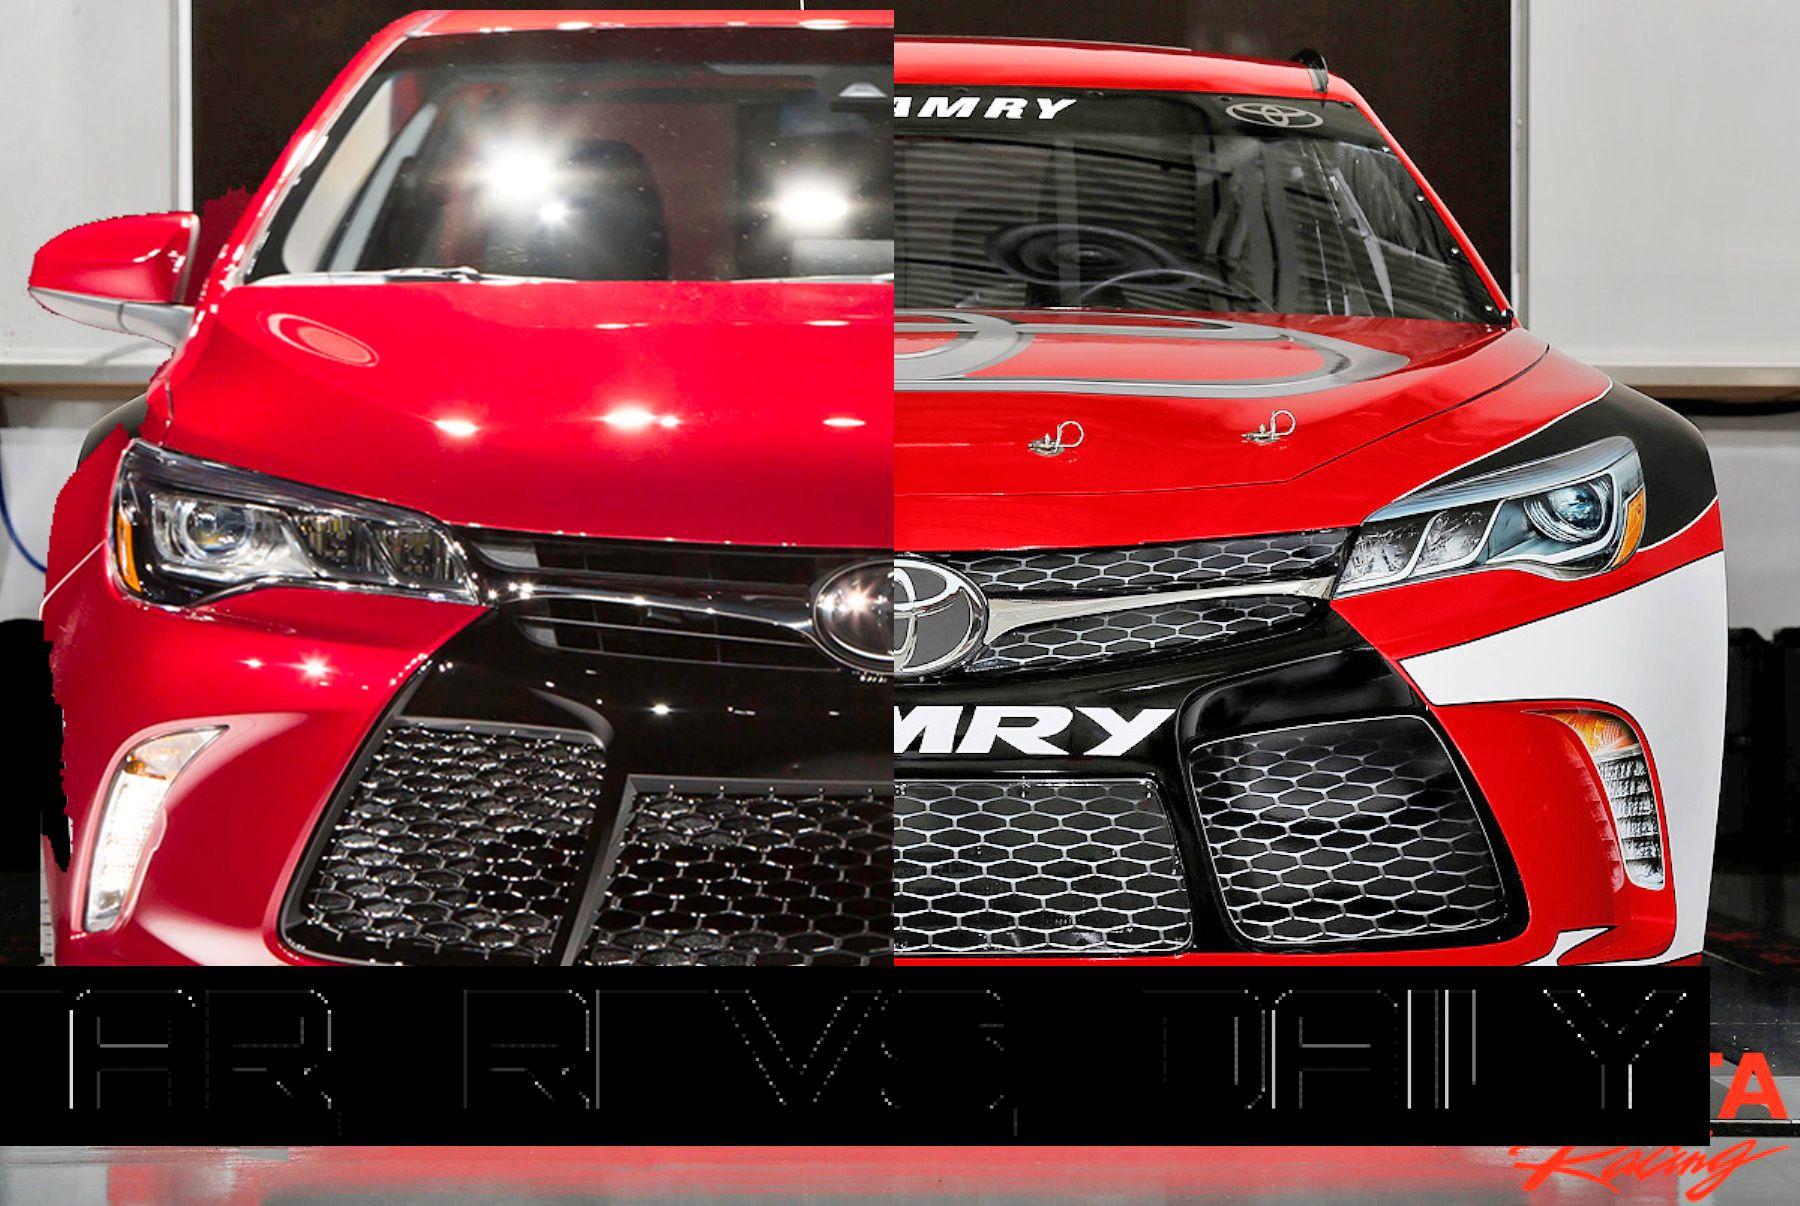 Gen-6 Toyota Camry NASCAR Revealed Ahead of 2015 Season